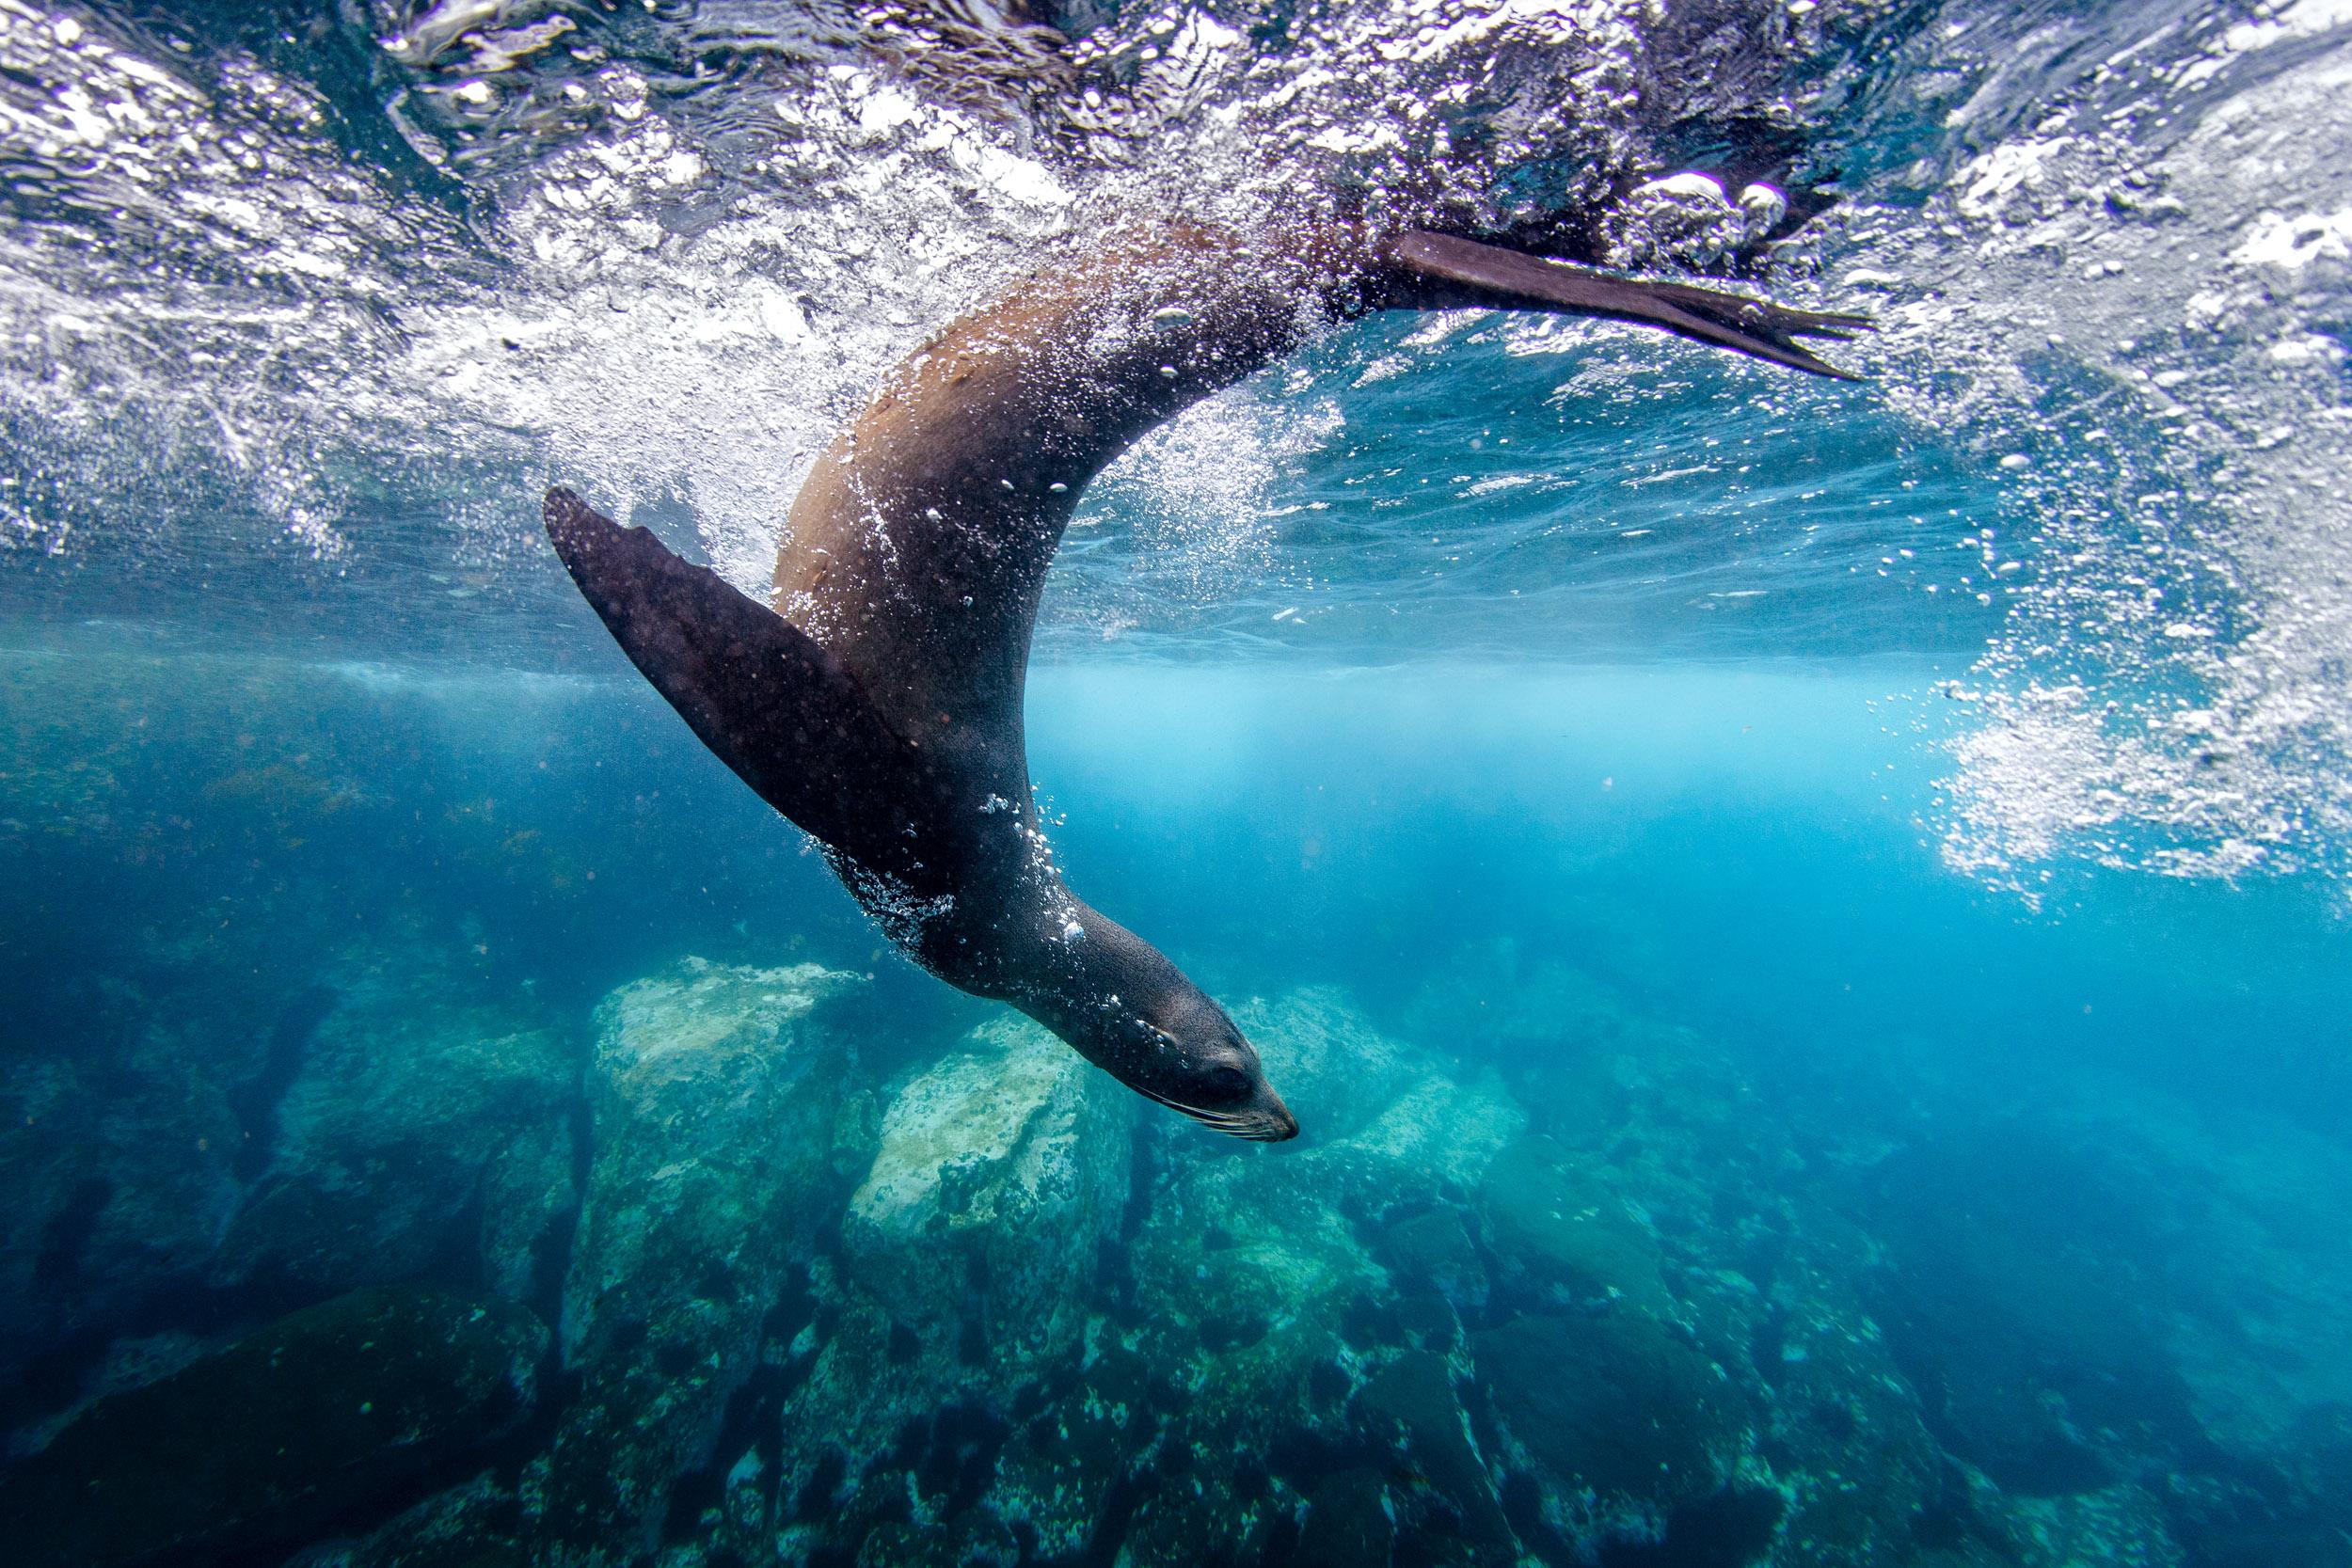 seals-narooma-watershot-swimming-nsw.jpg